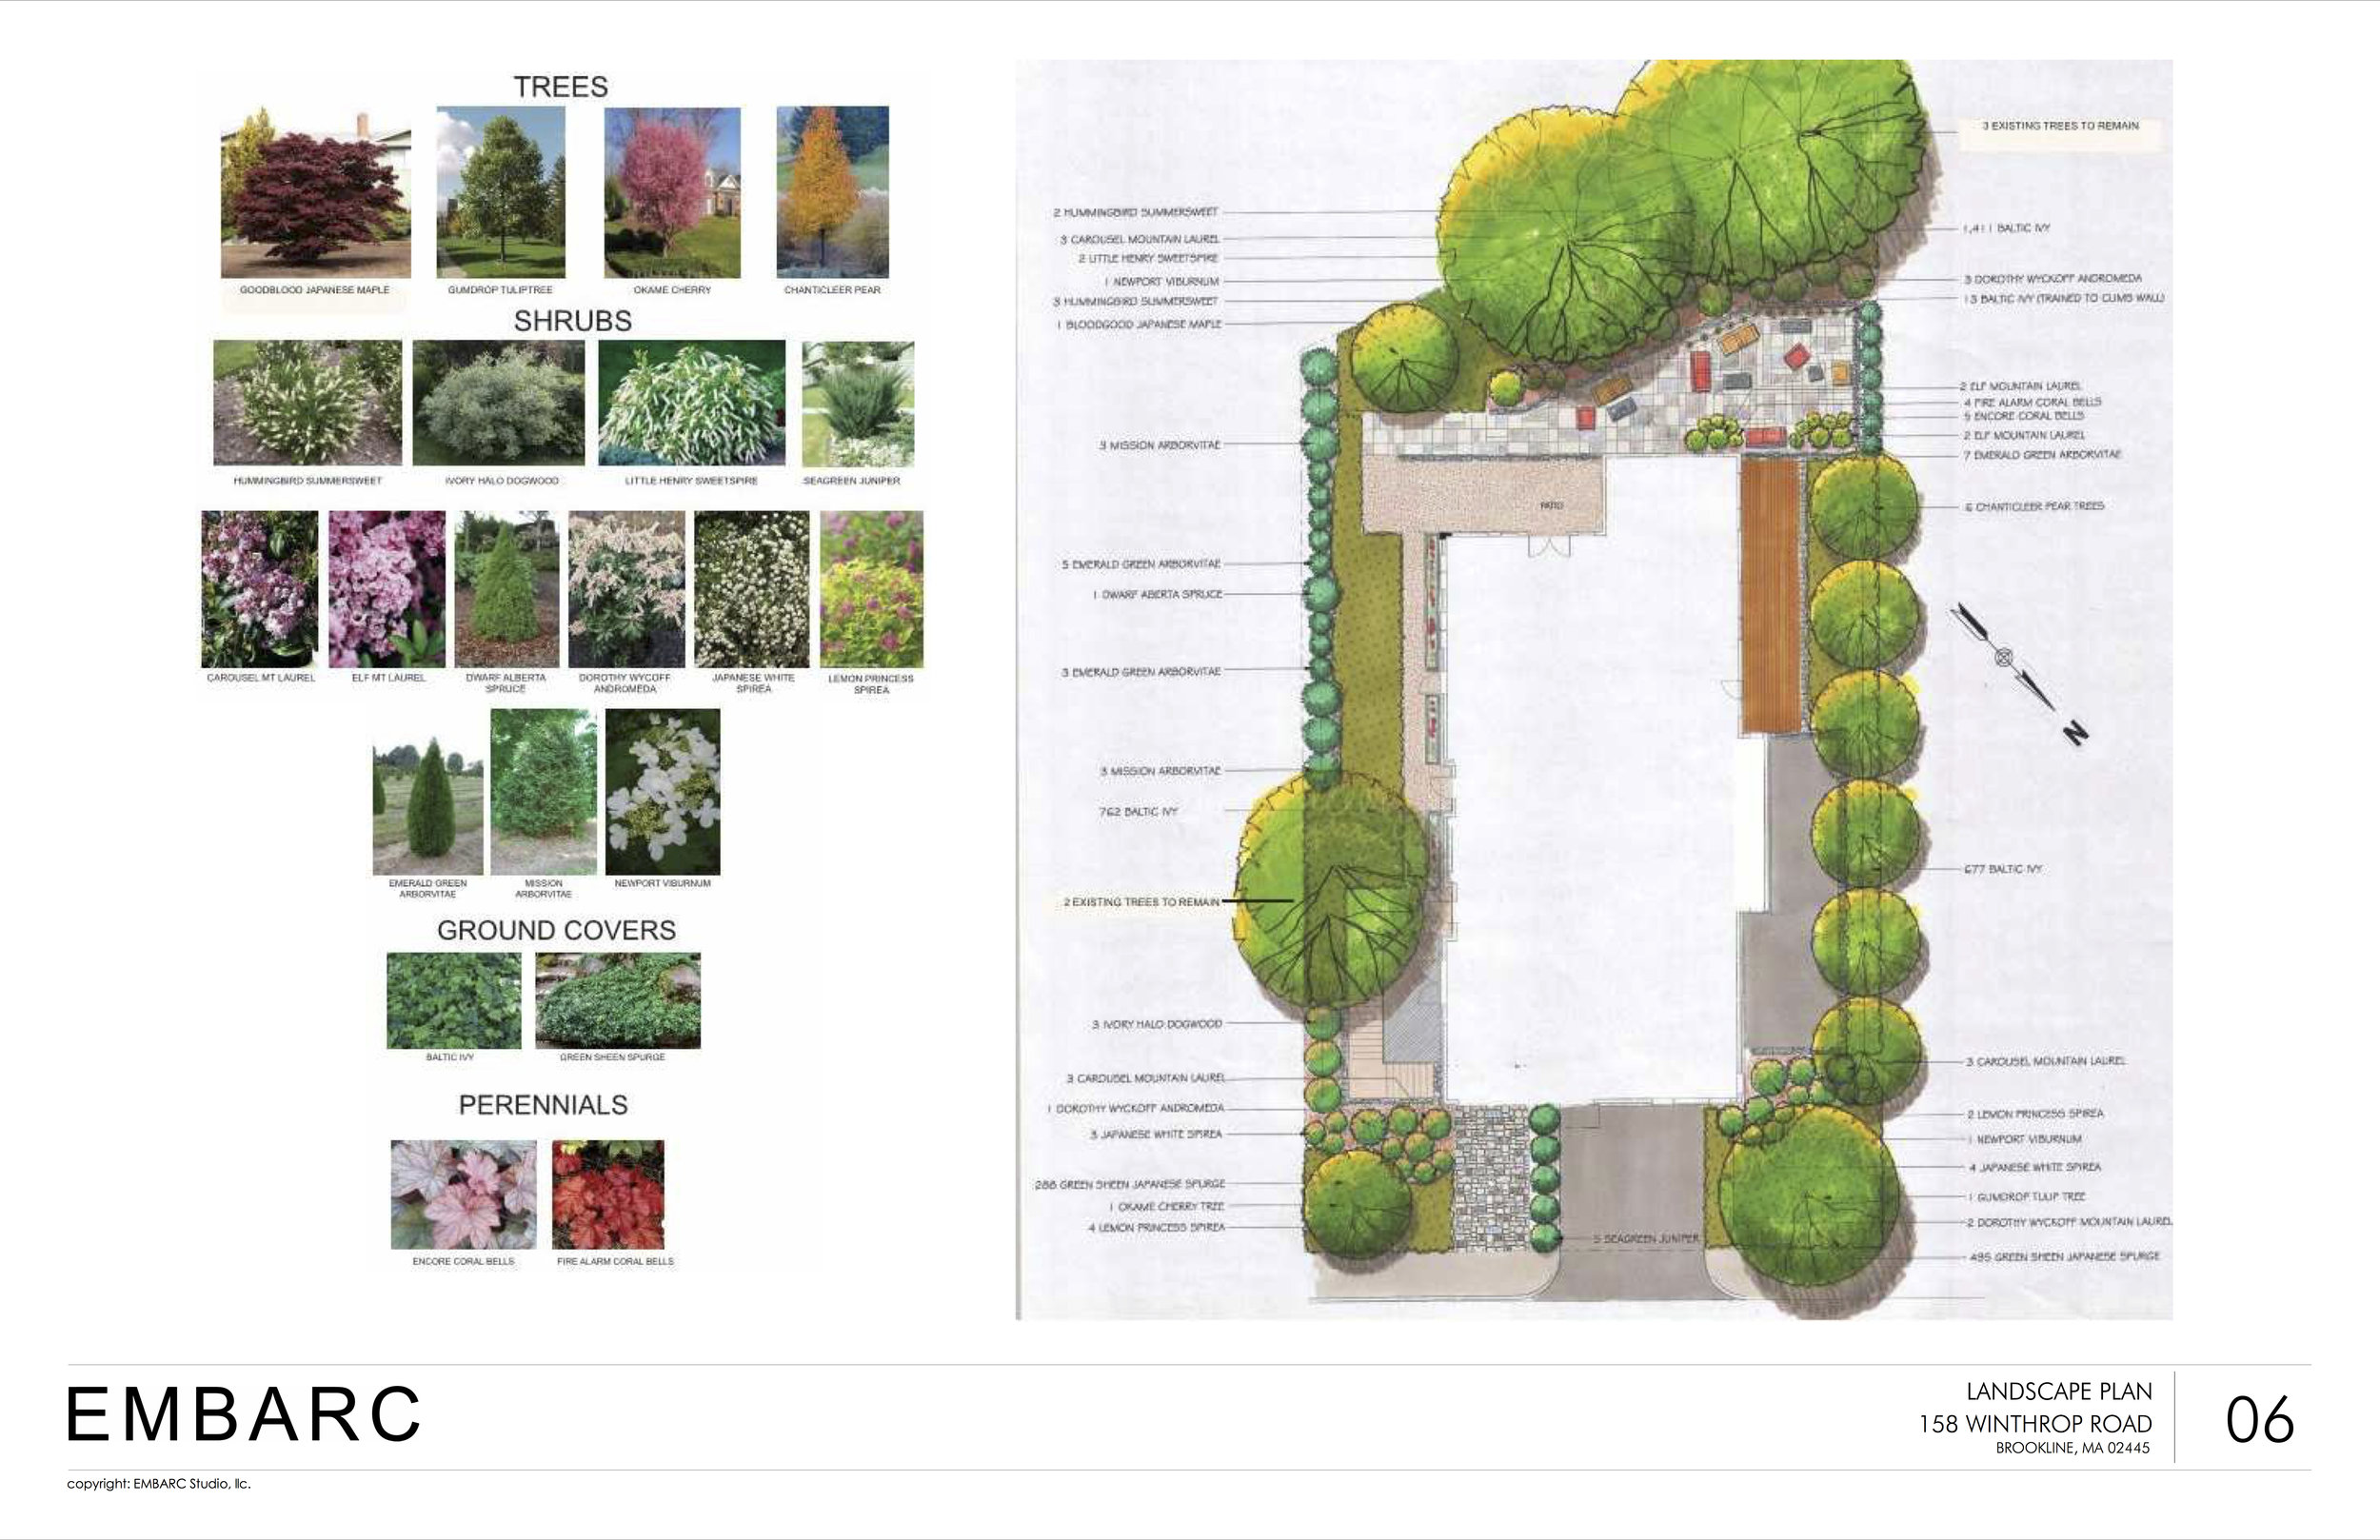 158W Landscaping plan JPG.jpg